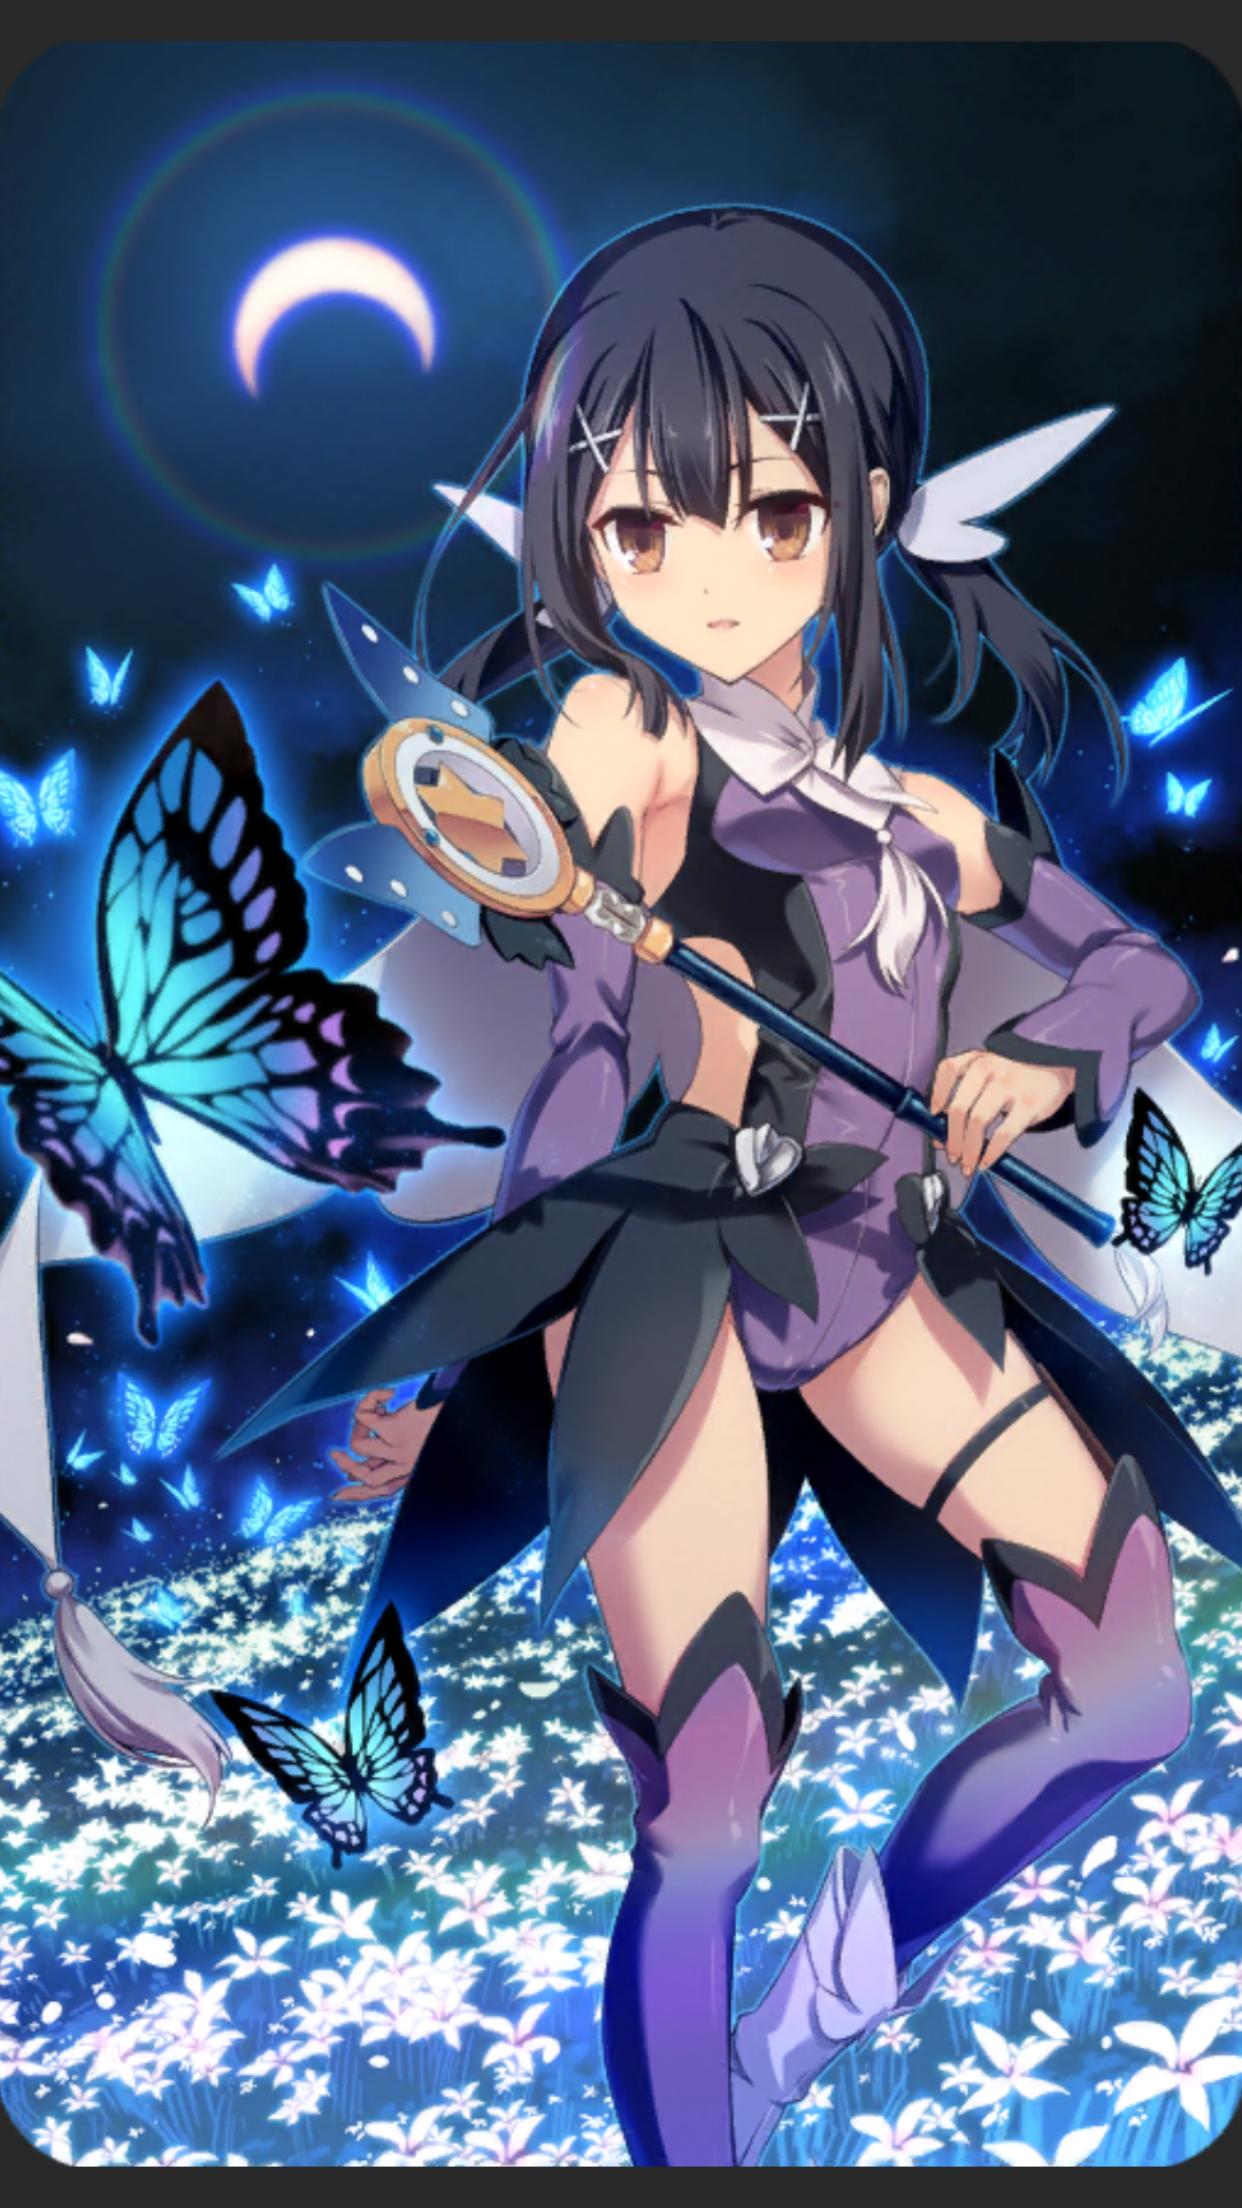 Fate Grand Order 星4サーヴァント美遊実装 復刻コラボイベント